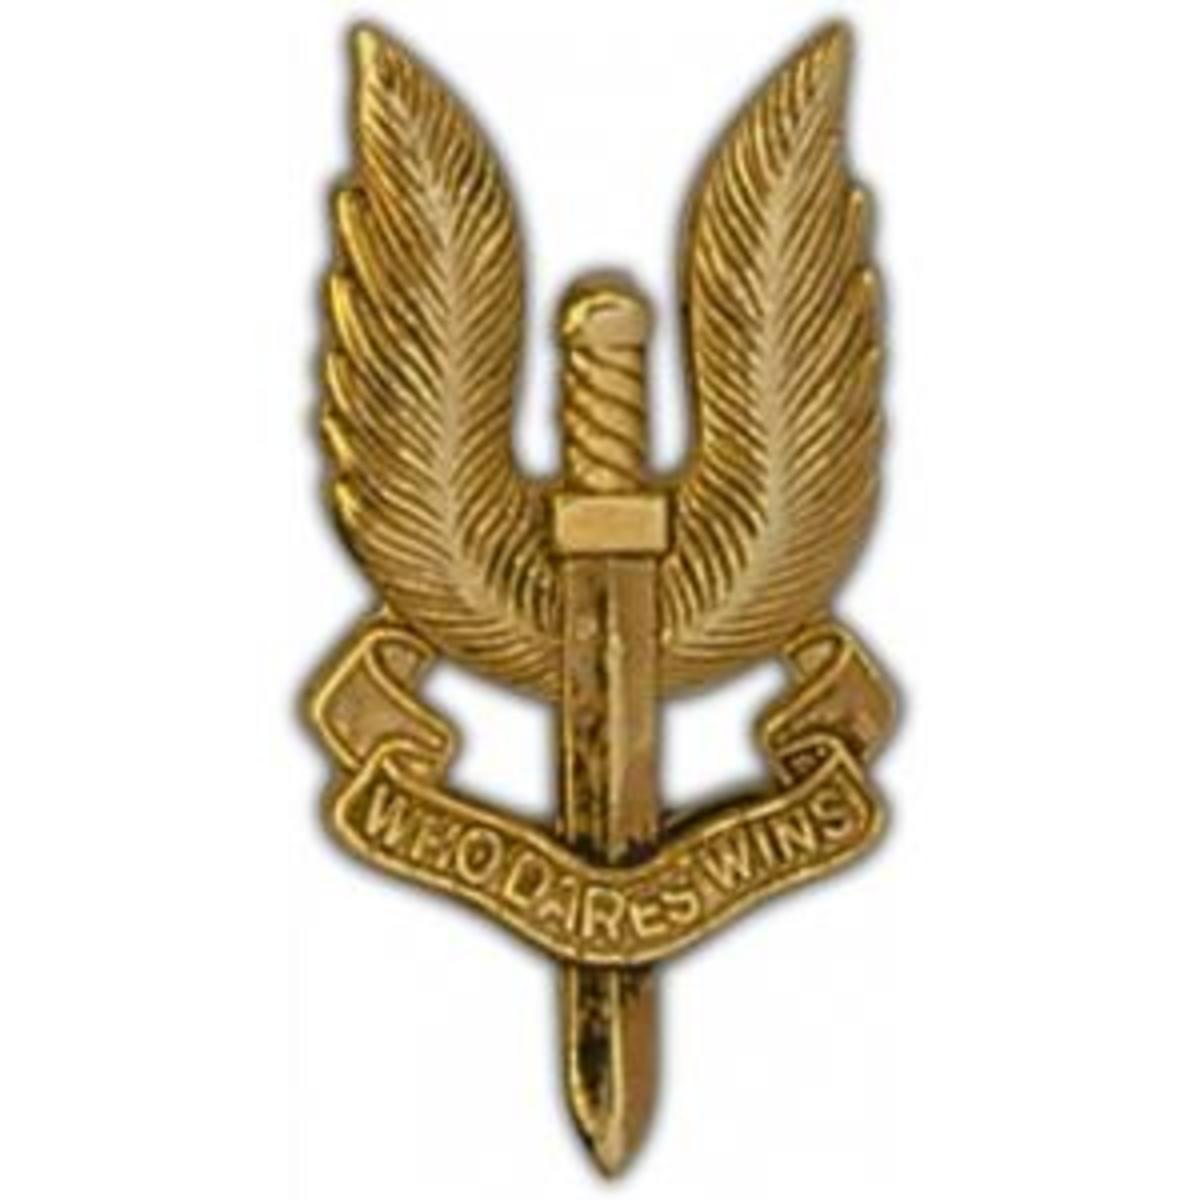 The SAS Logo/Motto - Who Dares Wins